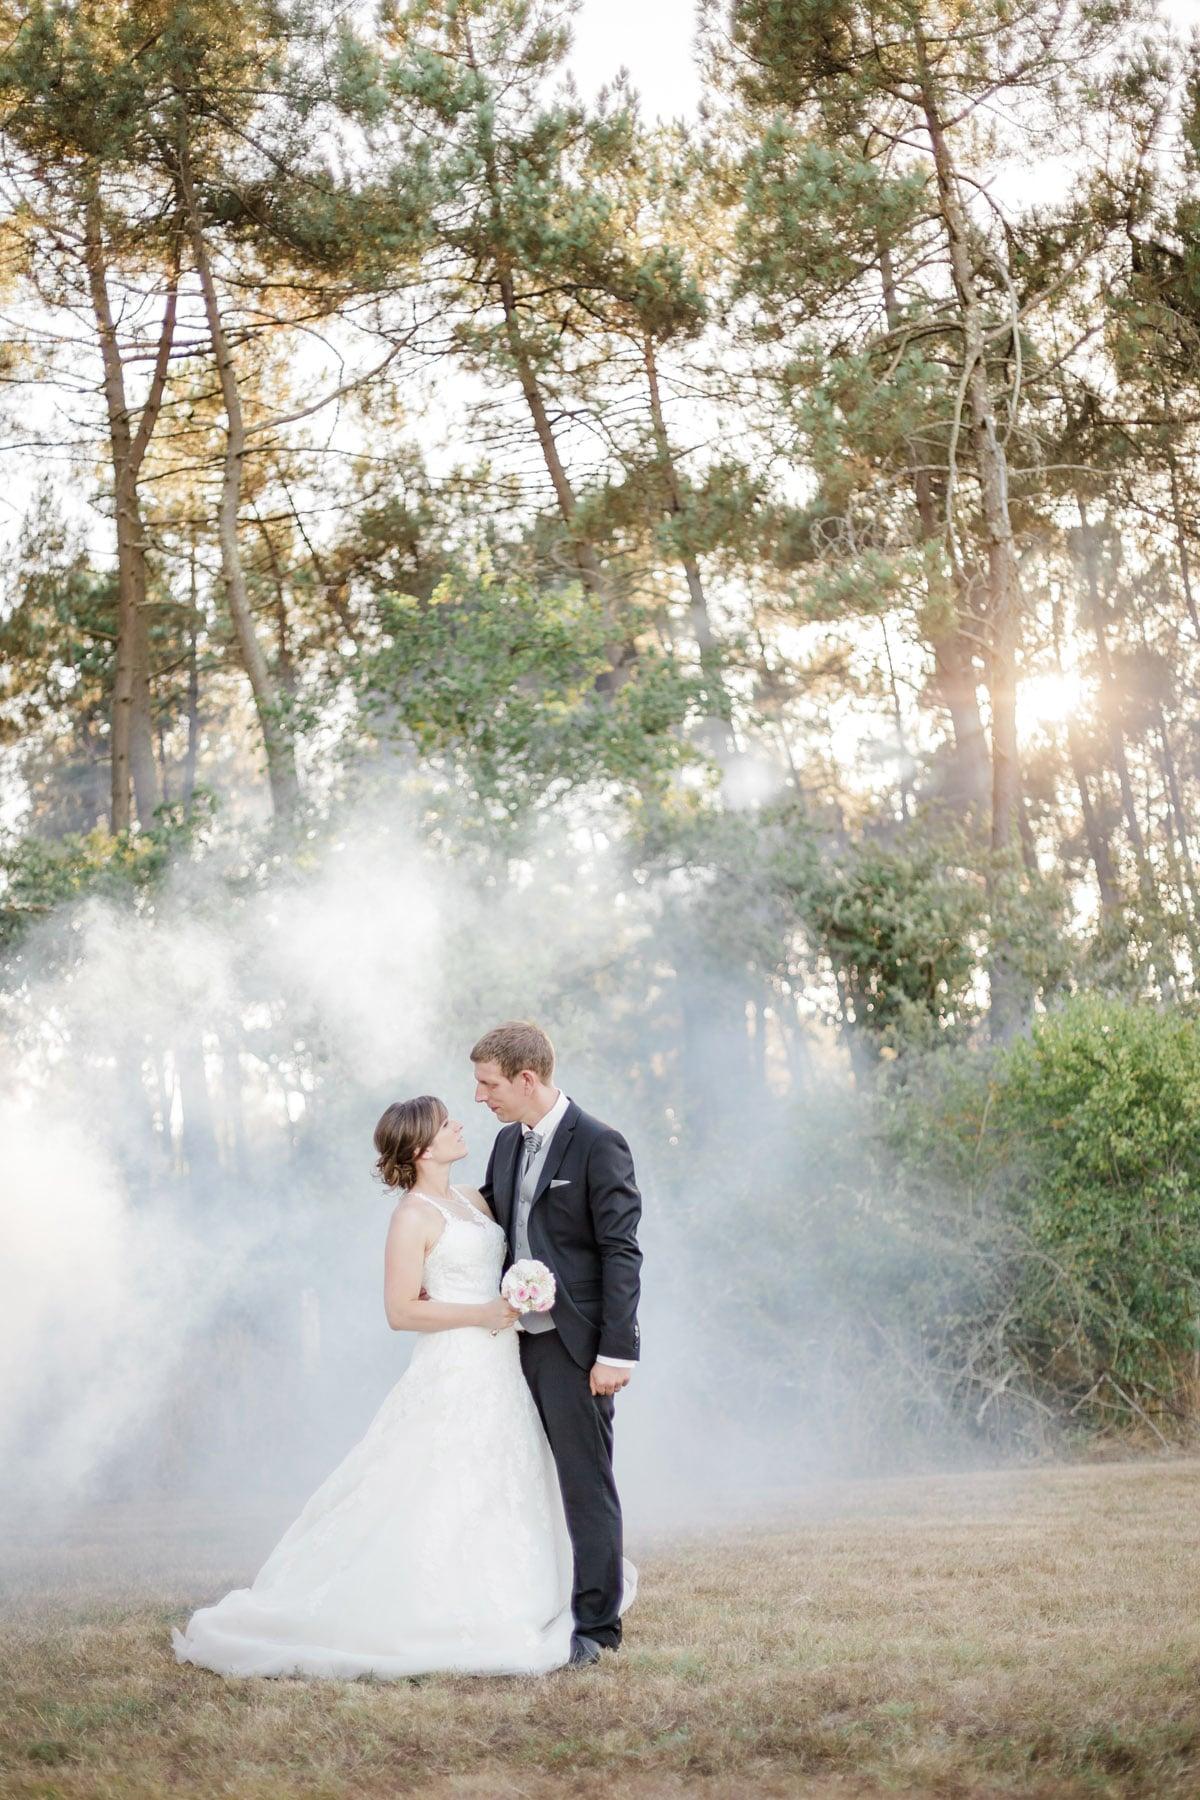 photographe mariage bordeaux landes fineart francais sarah miramon blog 35